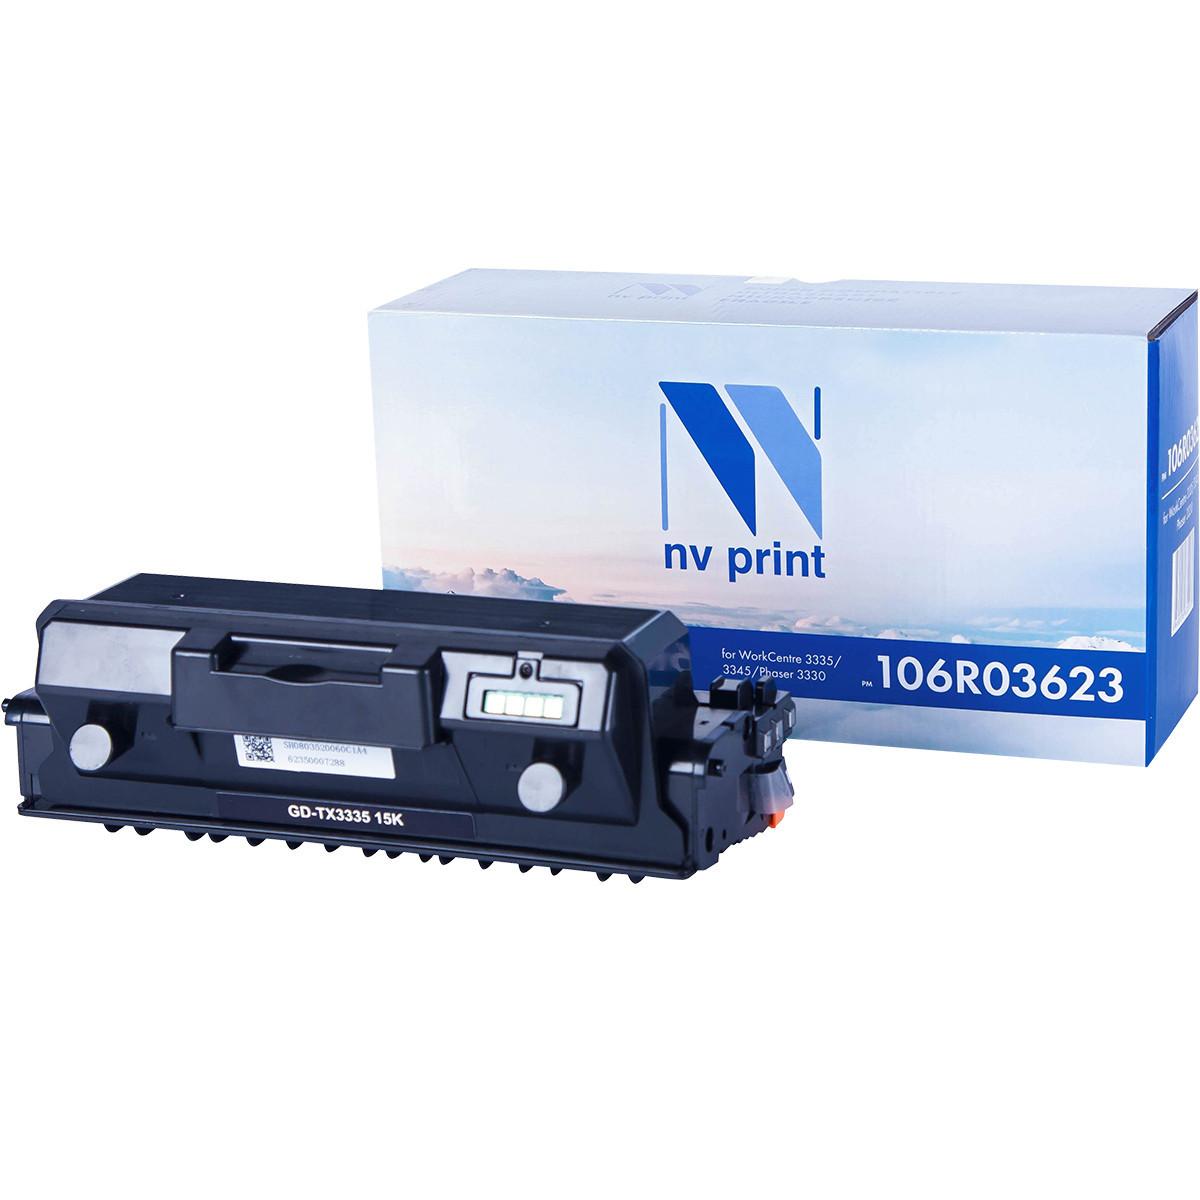 Тонер-картридж NVP совместимый Xerox 106R03623 для WorkCentre 3335/3345/Phaser 3330 (15000k)